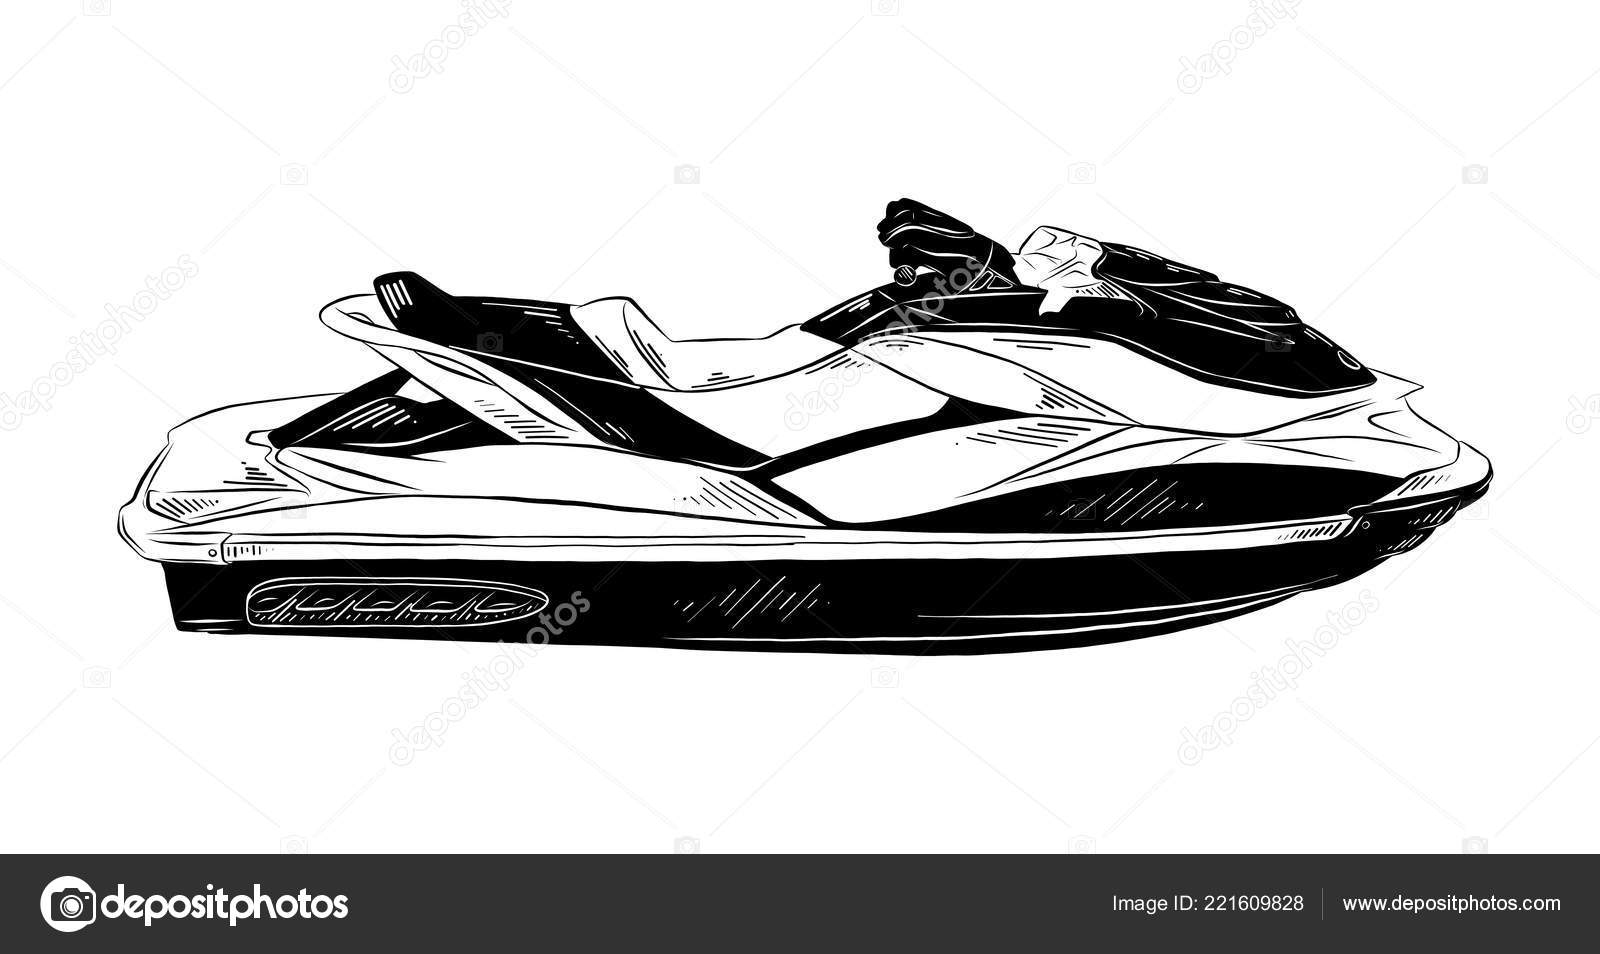 Vector illustration style grav pour affiches d coration impression croquis dessin image - Jet ski dessin ...